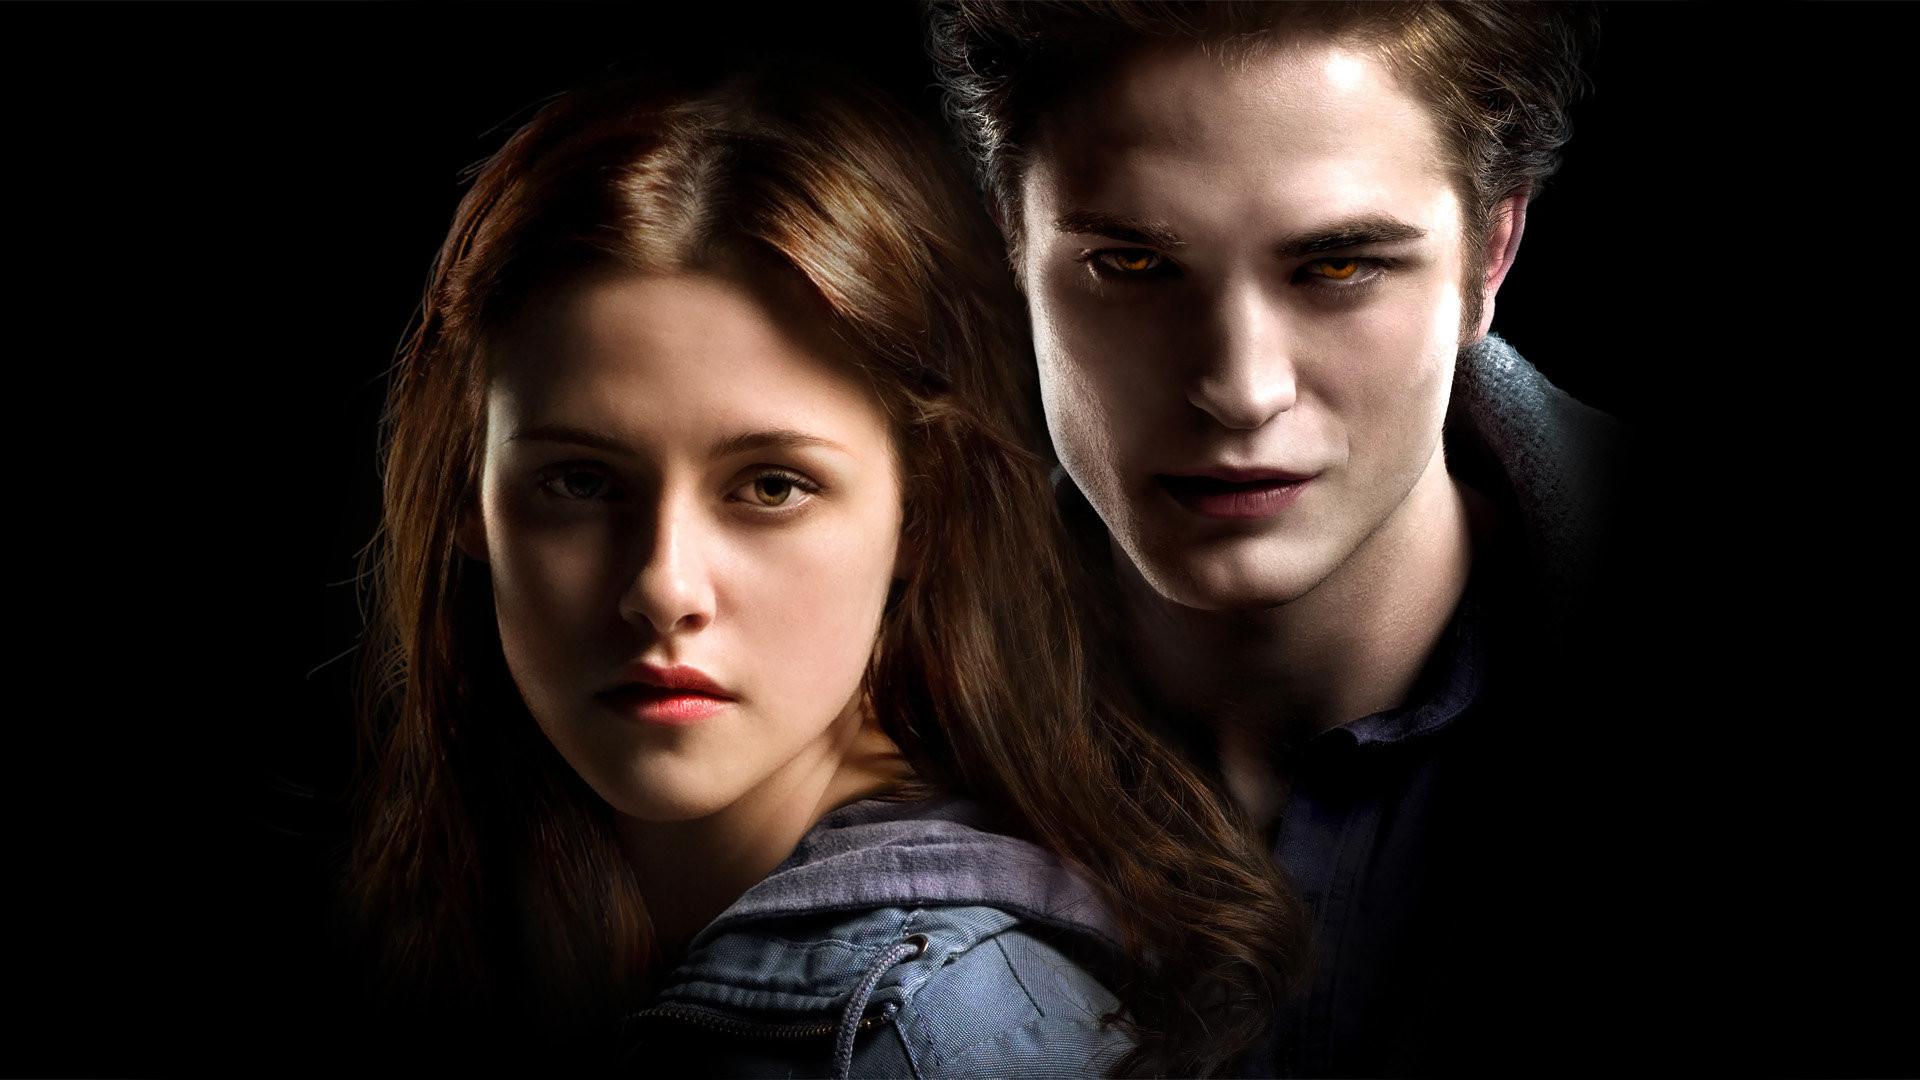 twilight 3 full movie online free viooz